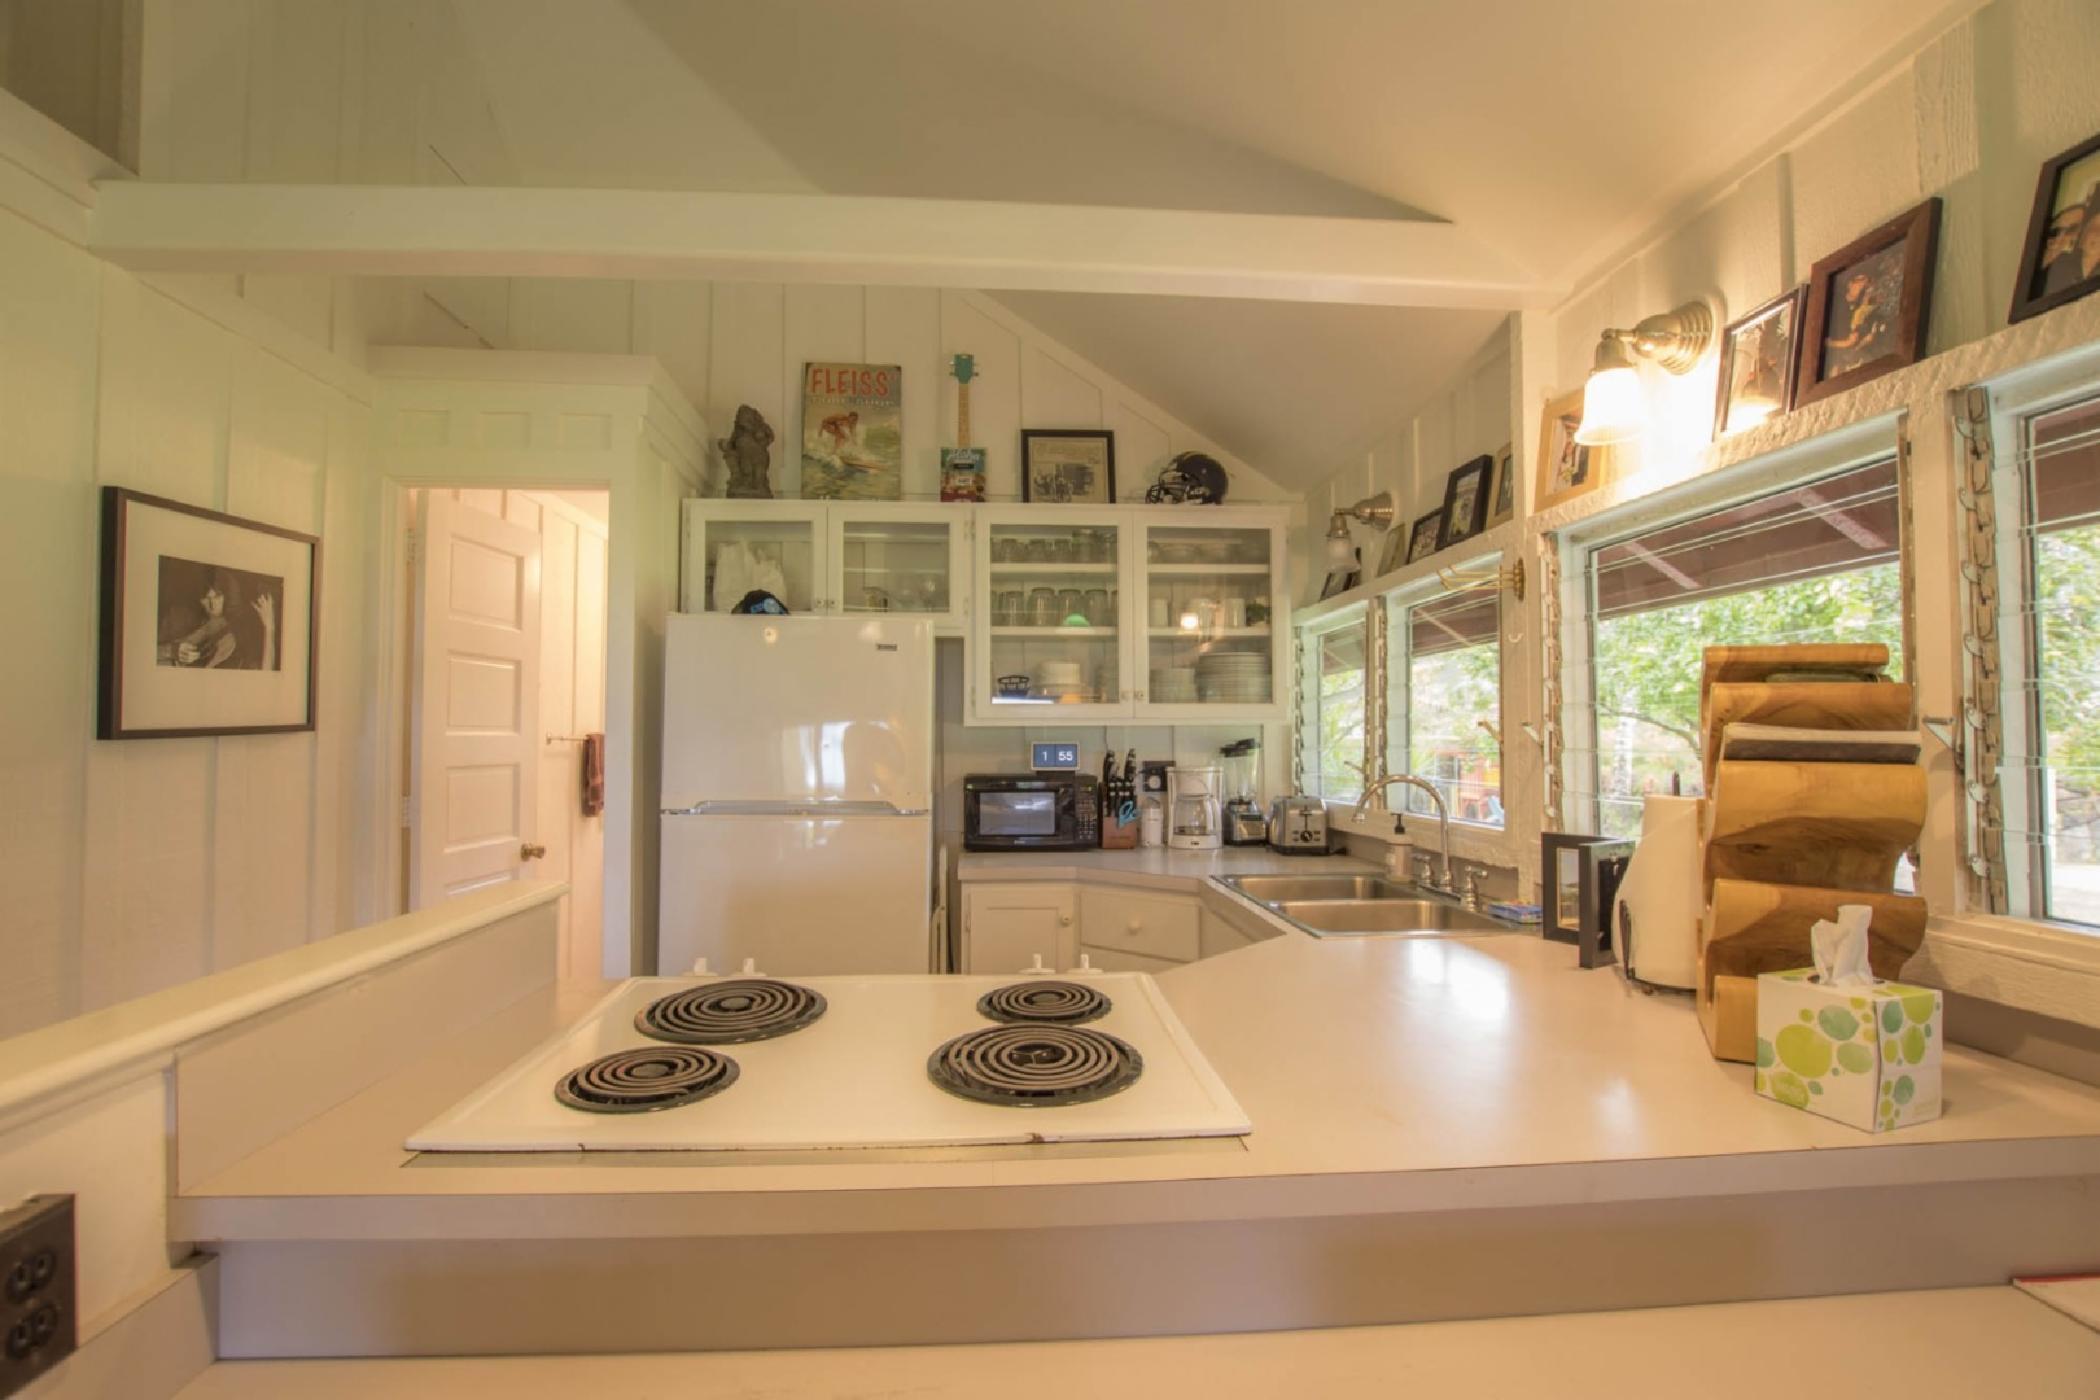 guest-house-kitchen.jpeg